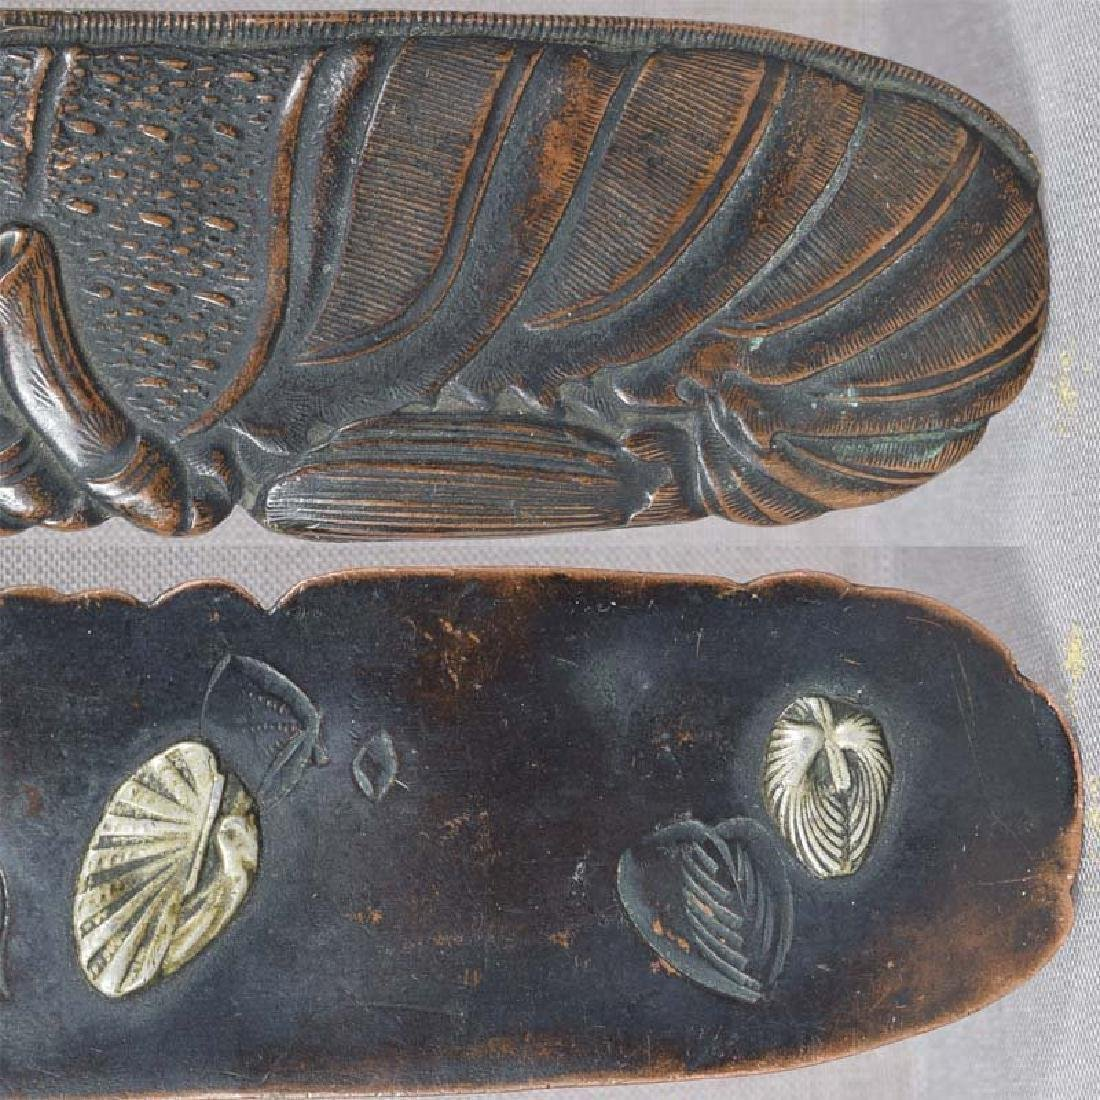 19c Japanese bronze page turner LOBSTER & shells - 6